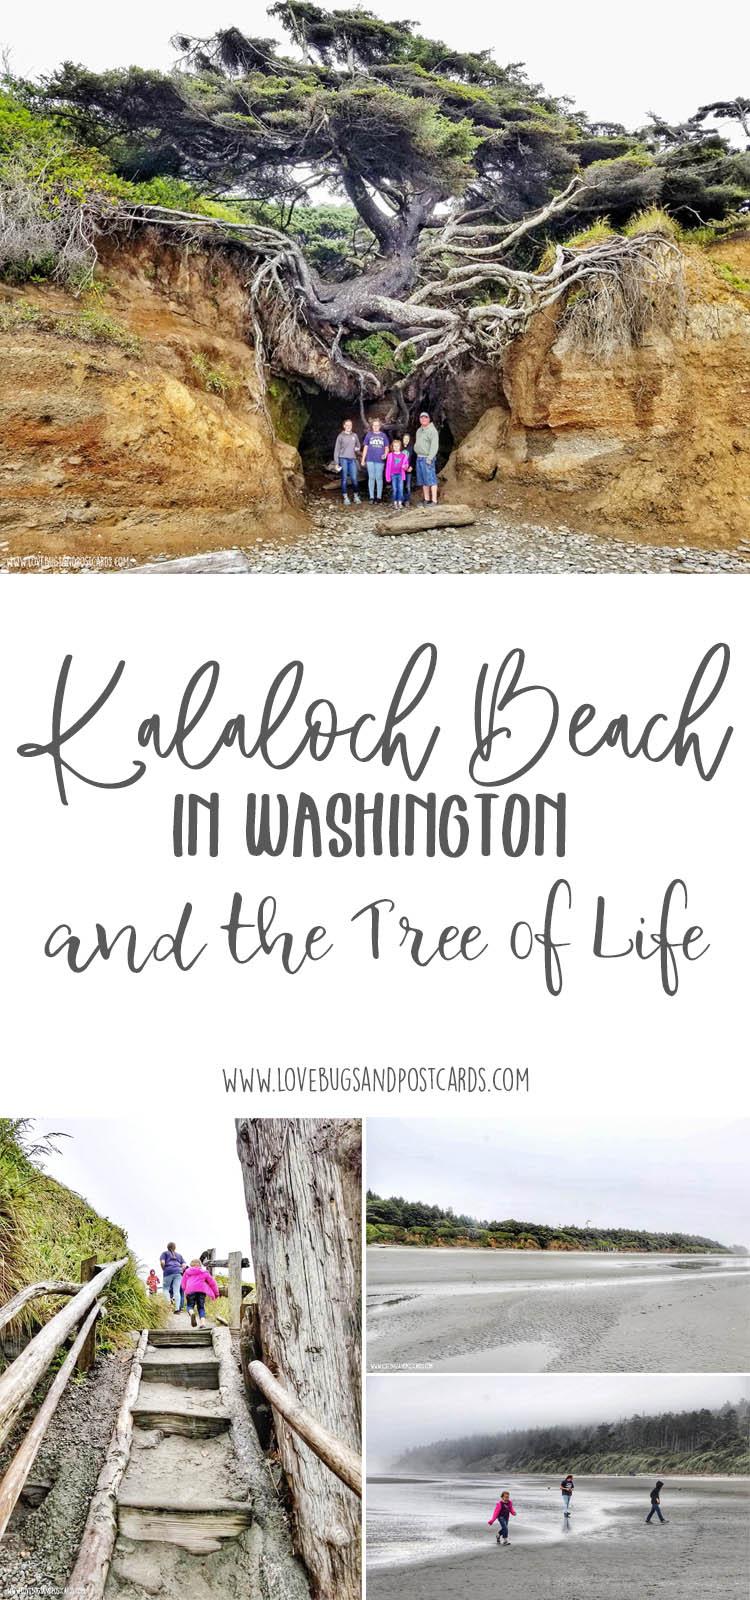 Kalaloch Beach in Washington and the Tree of Life (Tree Cave)